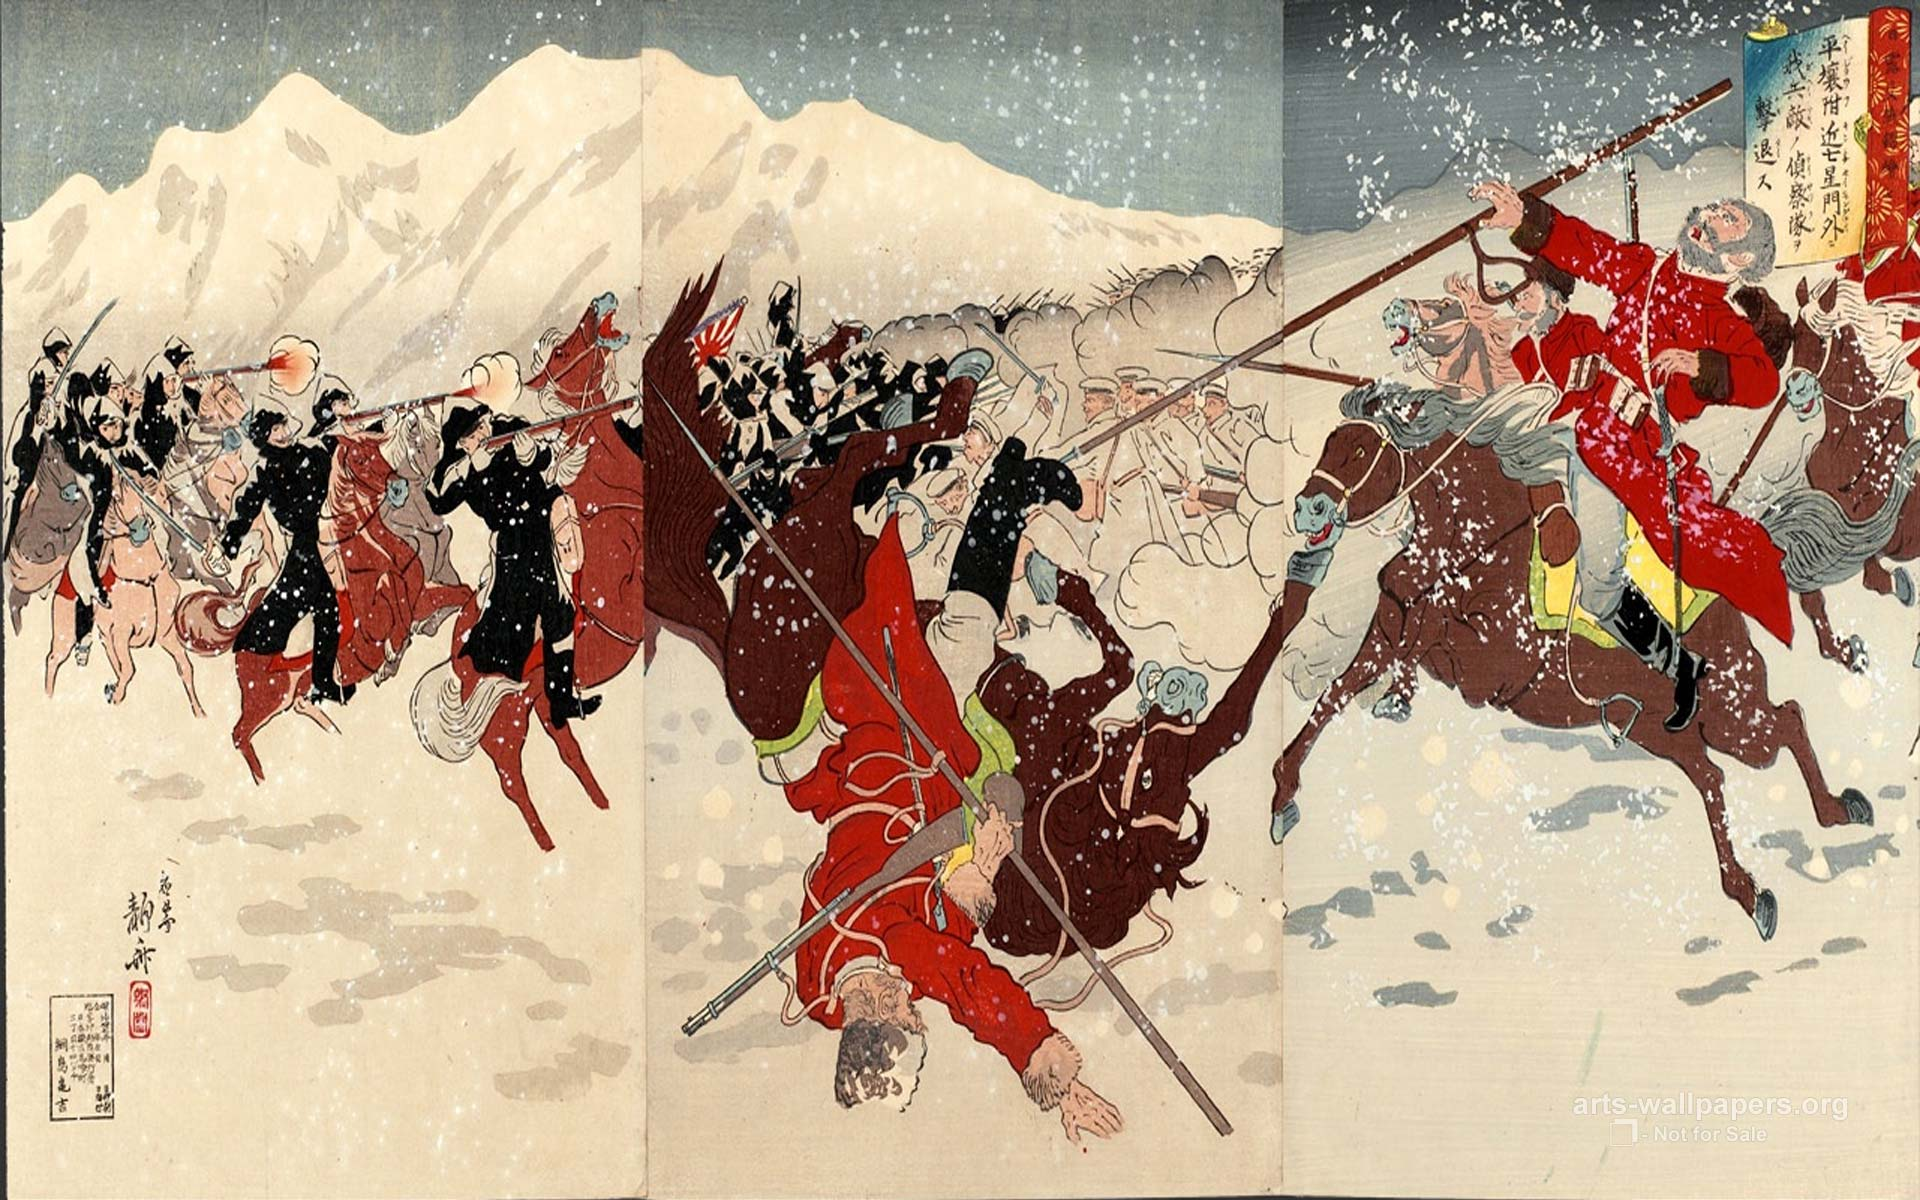 Japanese Art Imperial Paintings Wallpaper Wallpapers Paintings 1920x1200